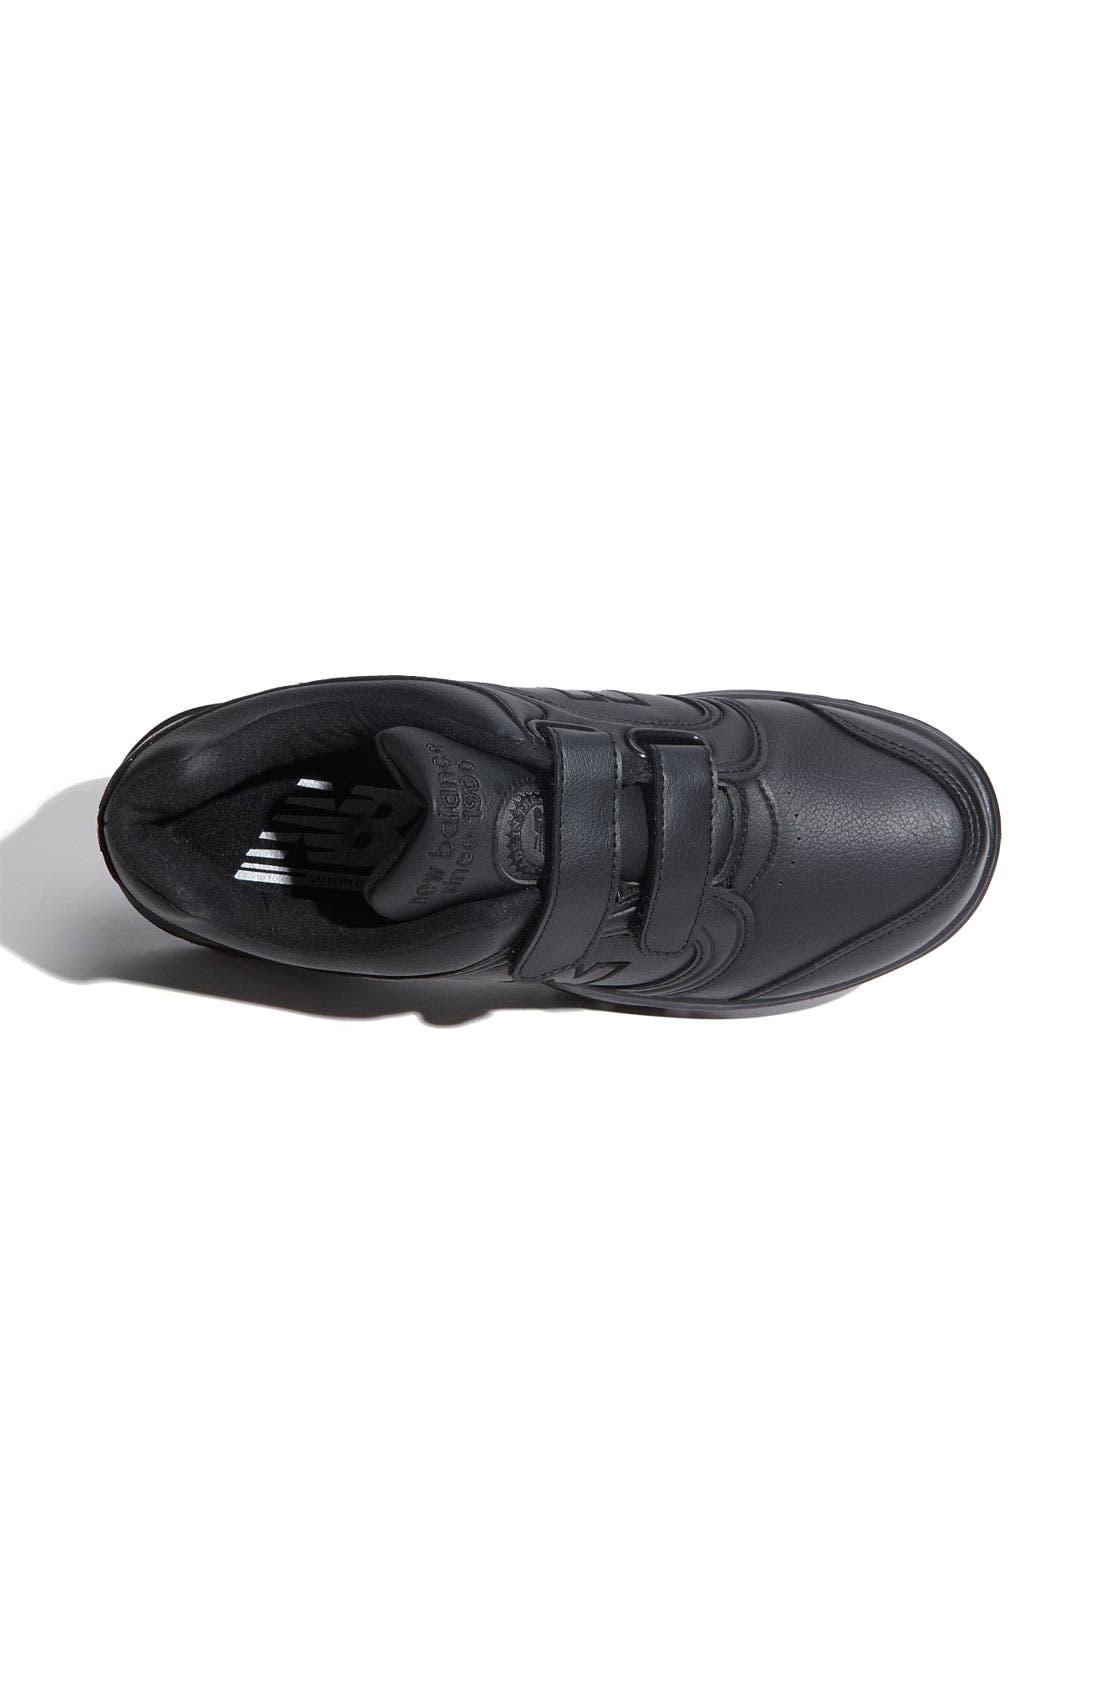 Alternate Image 3  - New Balance '812' Walking Shoe (Women)